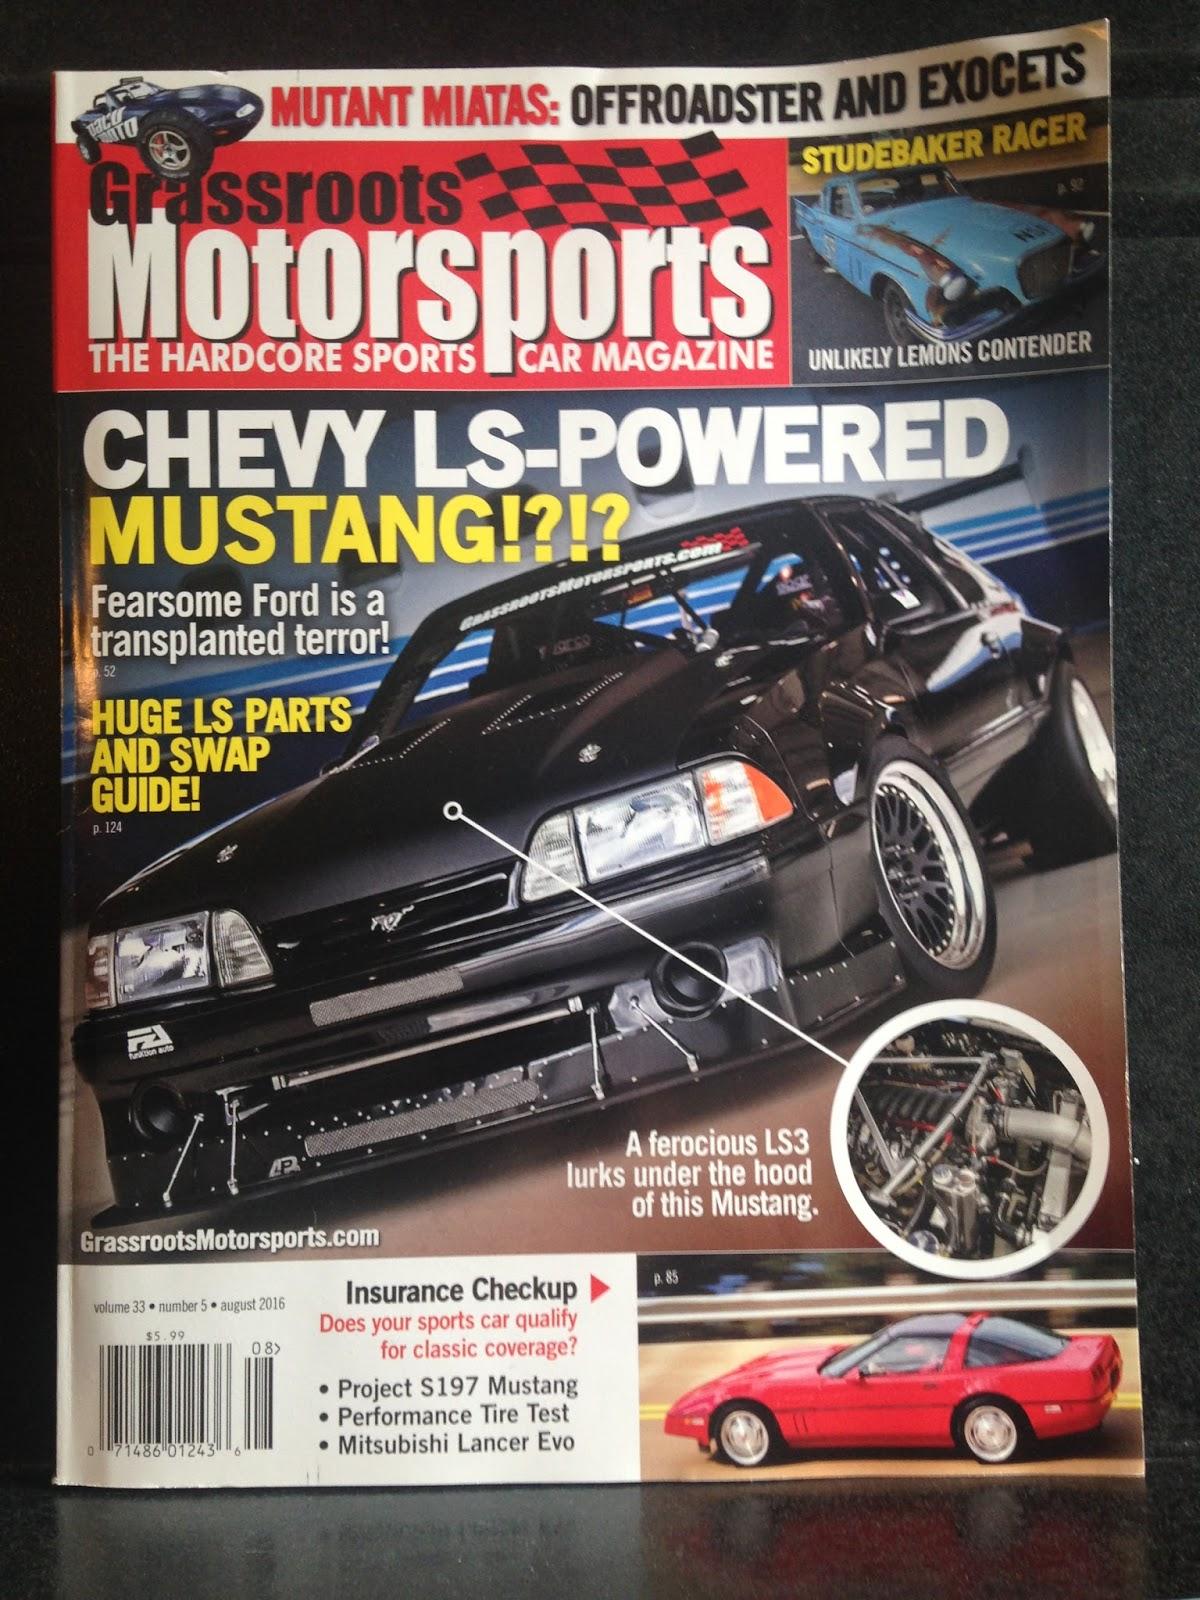 Nixon Motor Sports: Independence from Boring Magazines!